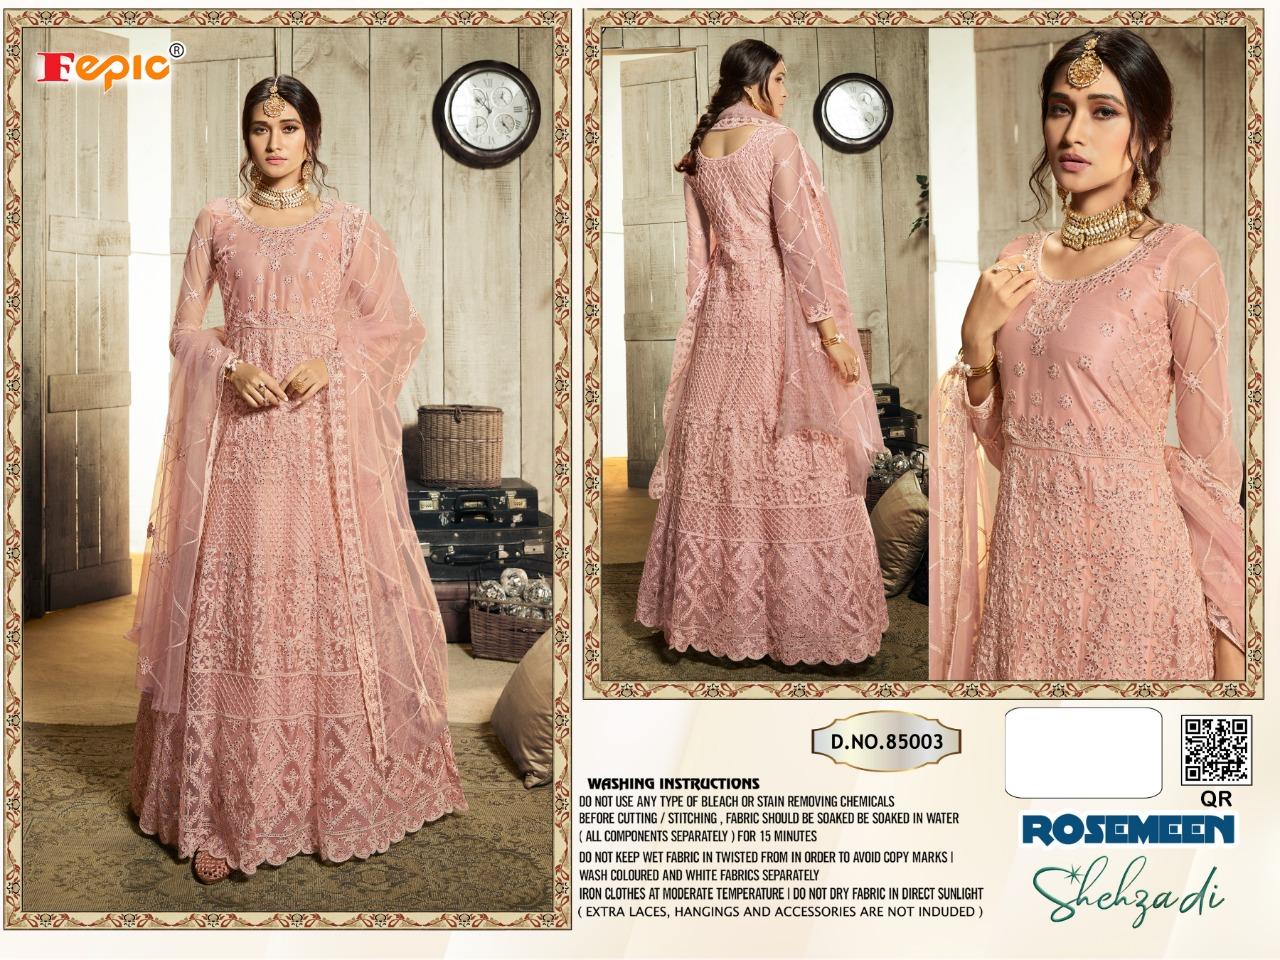 Fepic Rosemeen Shehzadi Blockbuster Vol 2 Designer Premium Net Wedding Wear Gown In Best Wholesale Rate